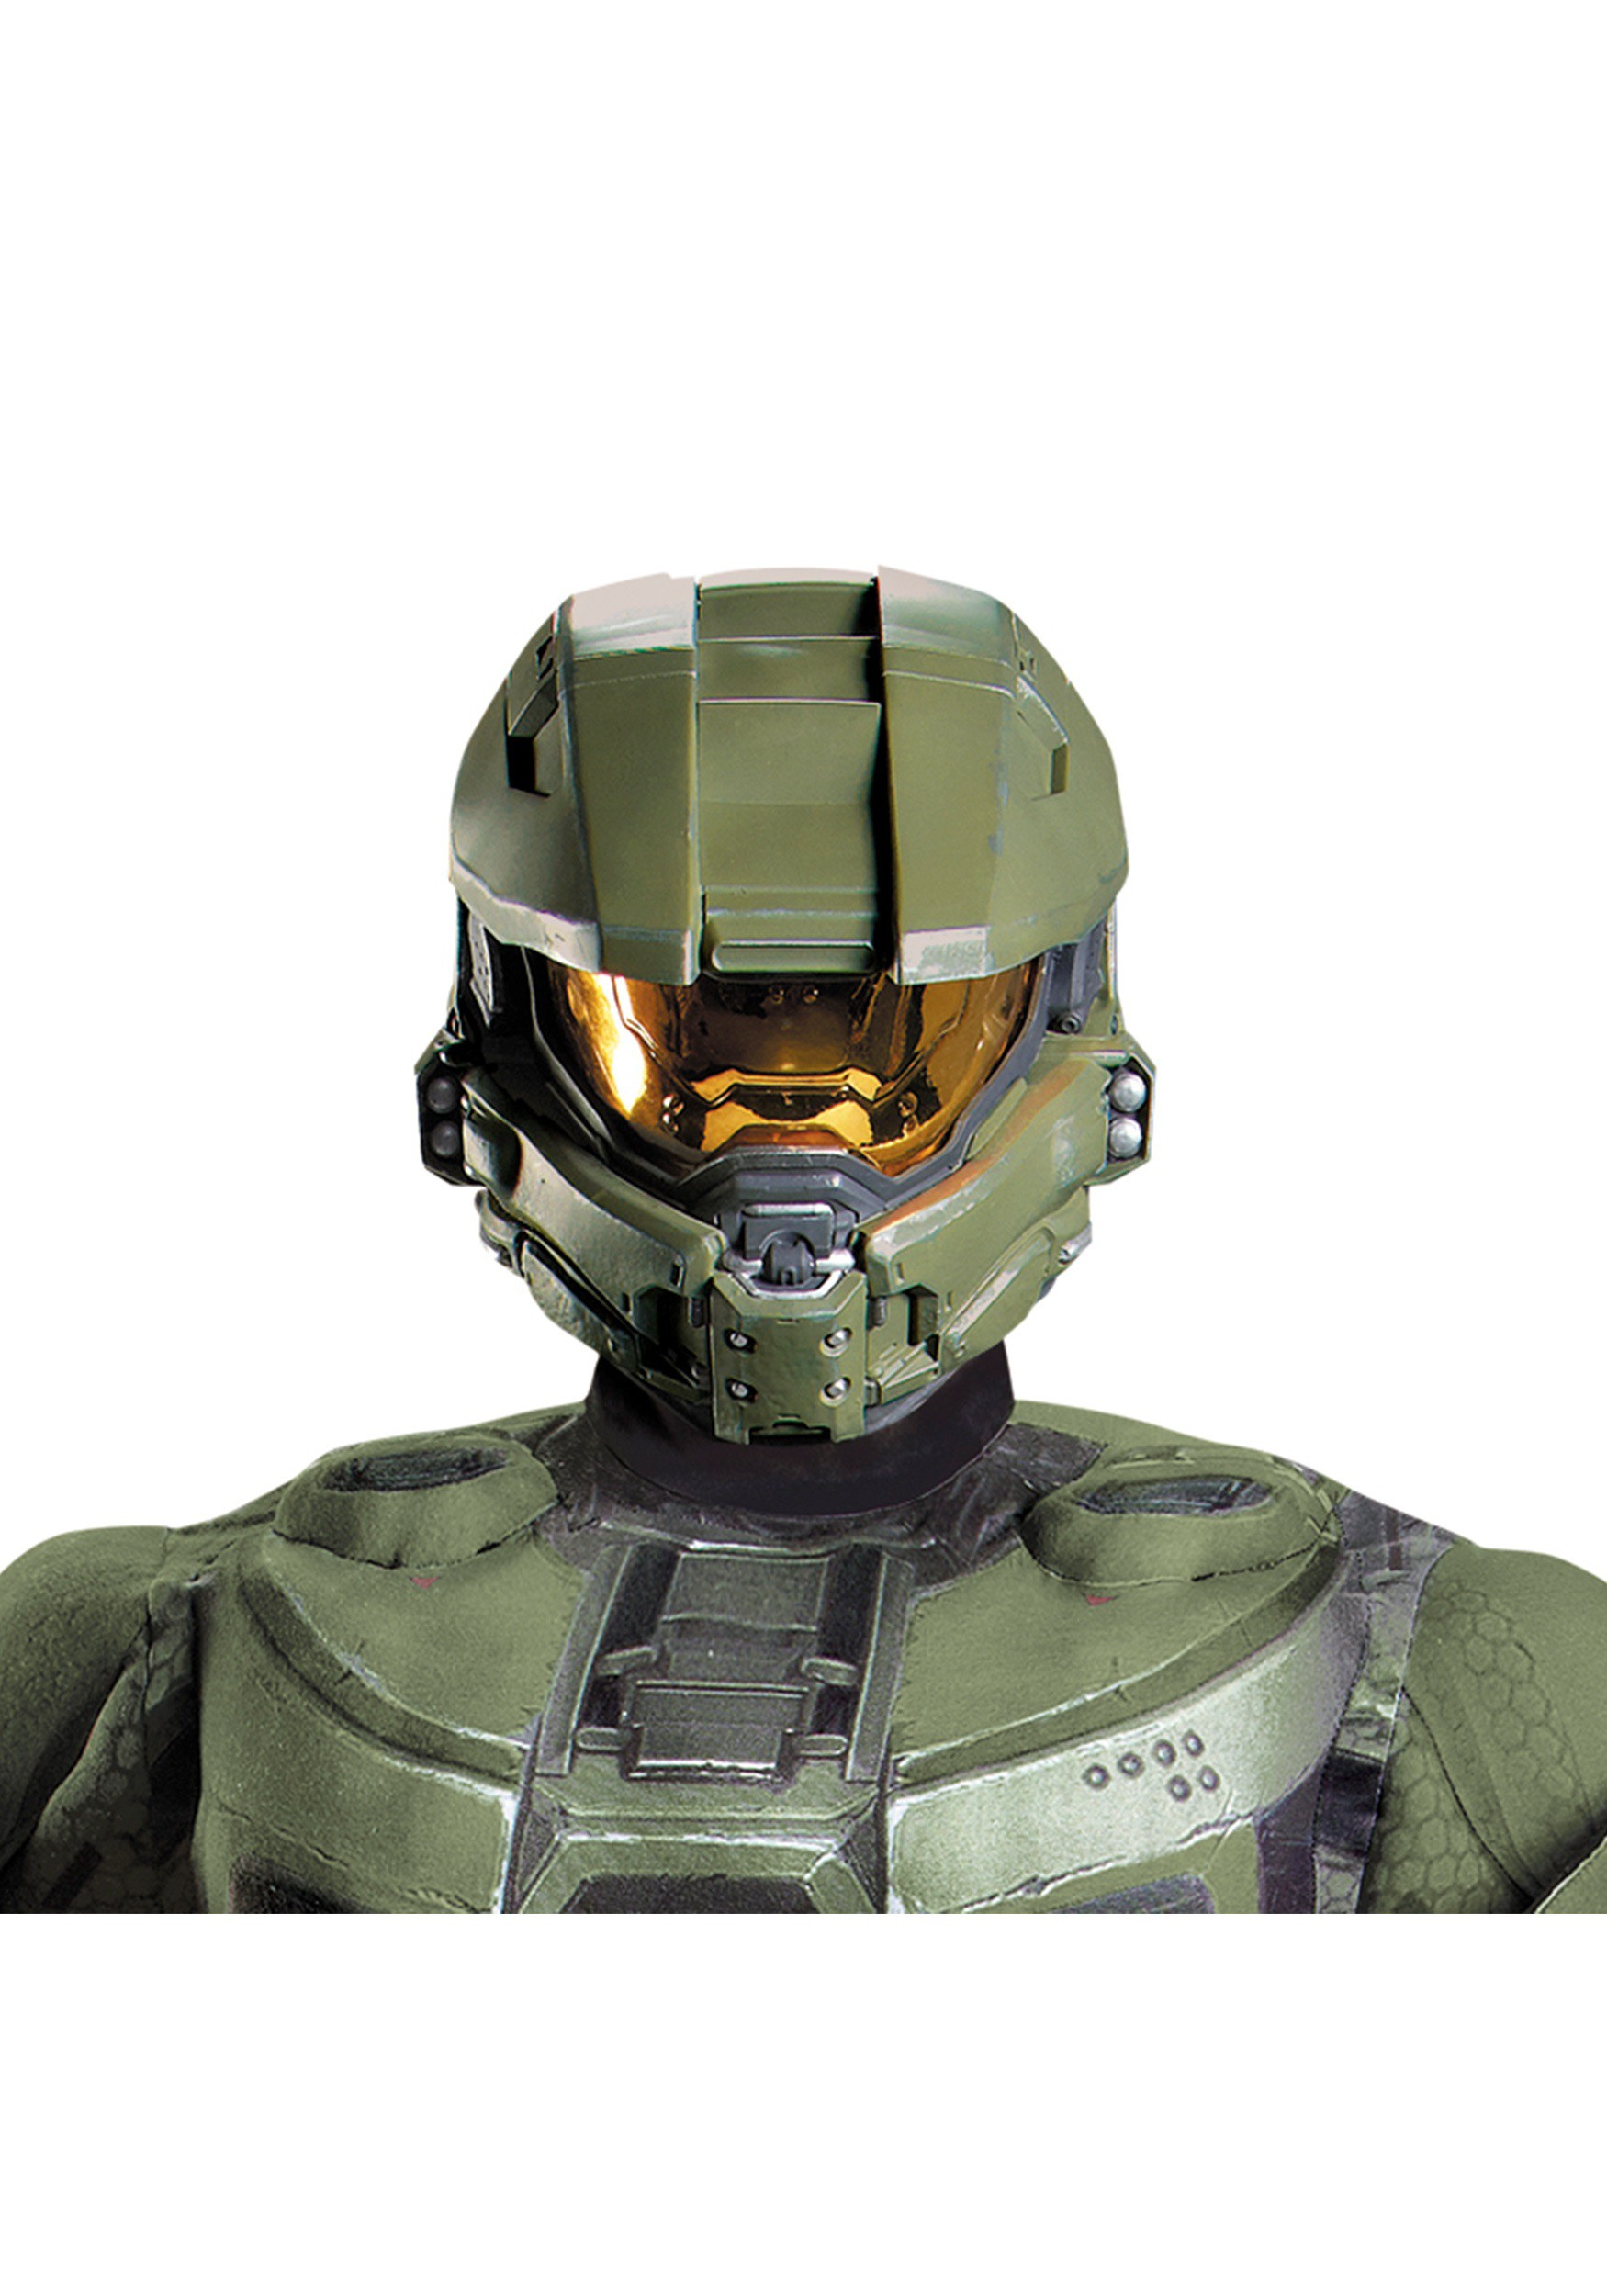 Halo Master Chief Costumes - HalloweenCostumes com